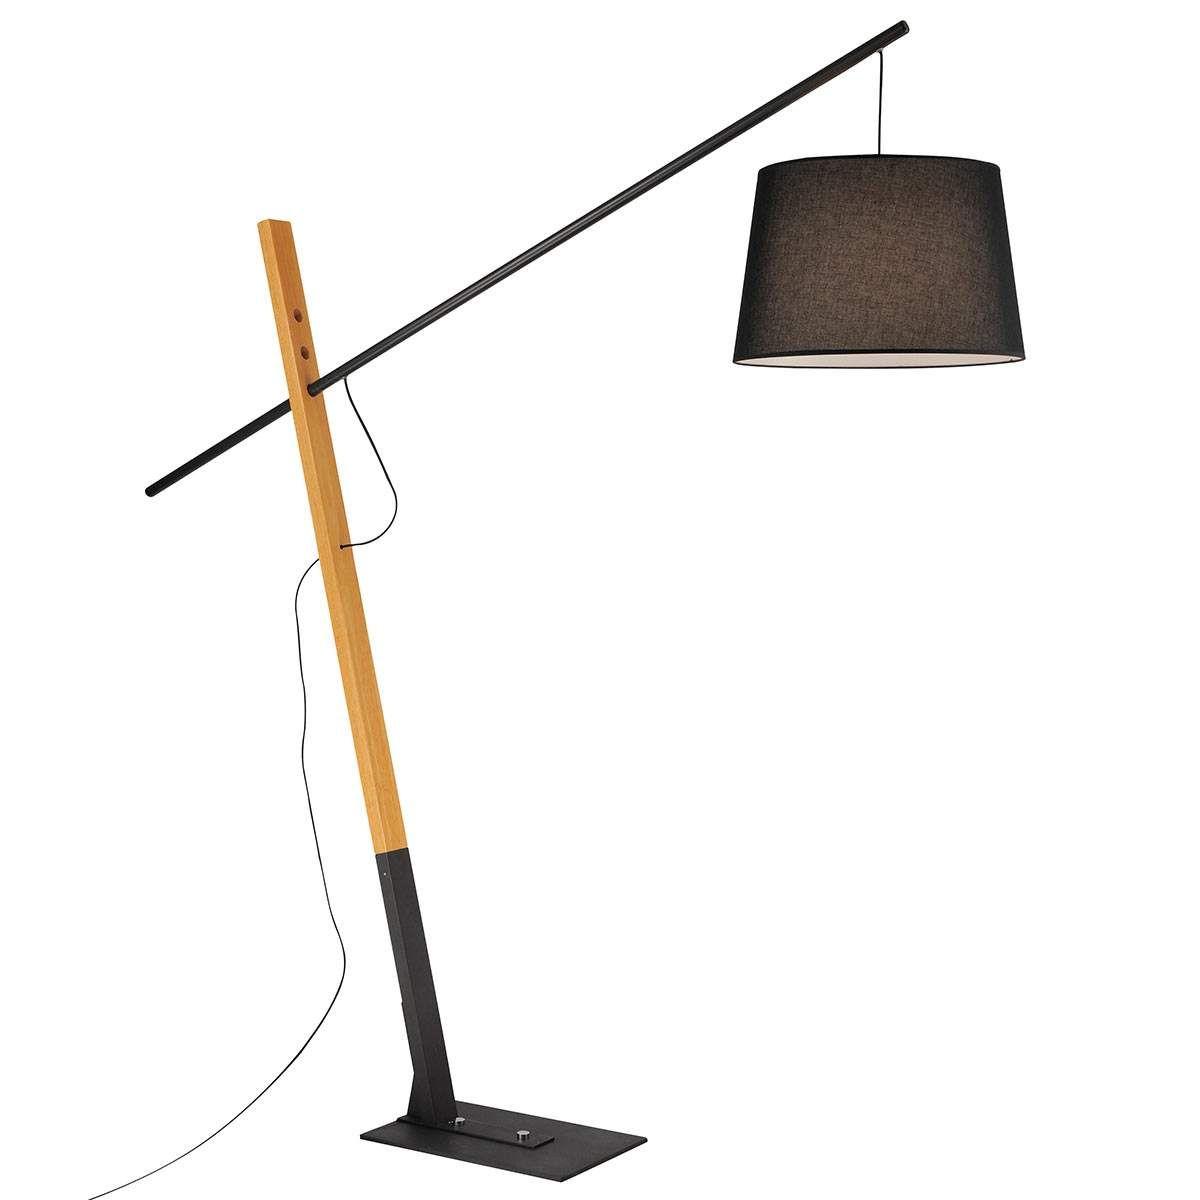 Kati Hohenverstellbare Stehleuchte Stehlampe Led Stehlampe